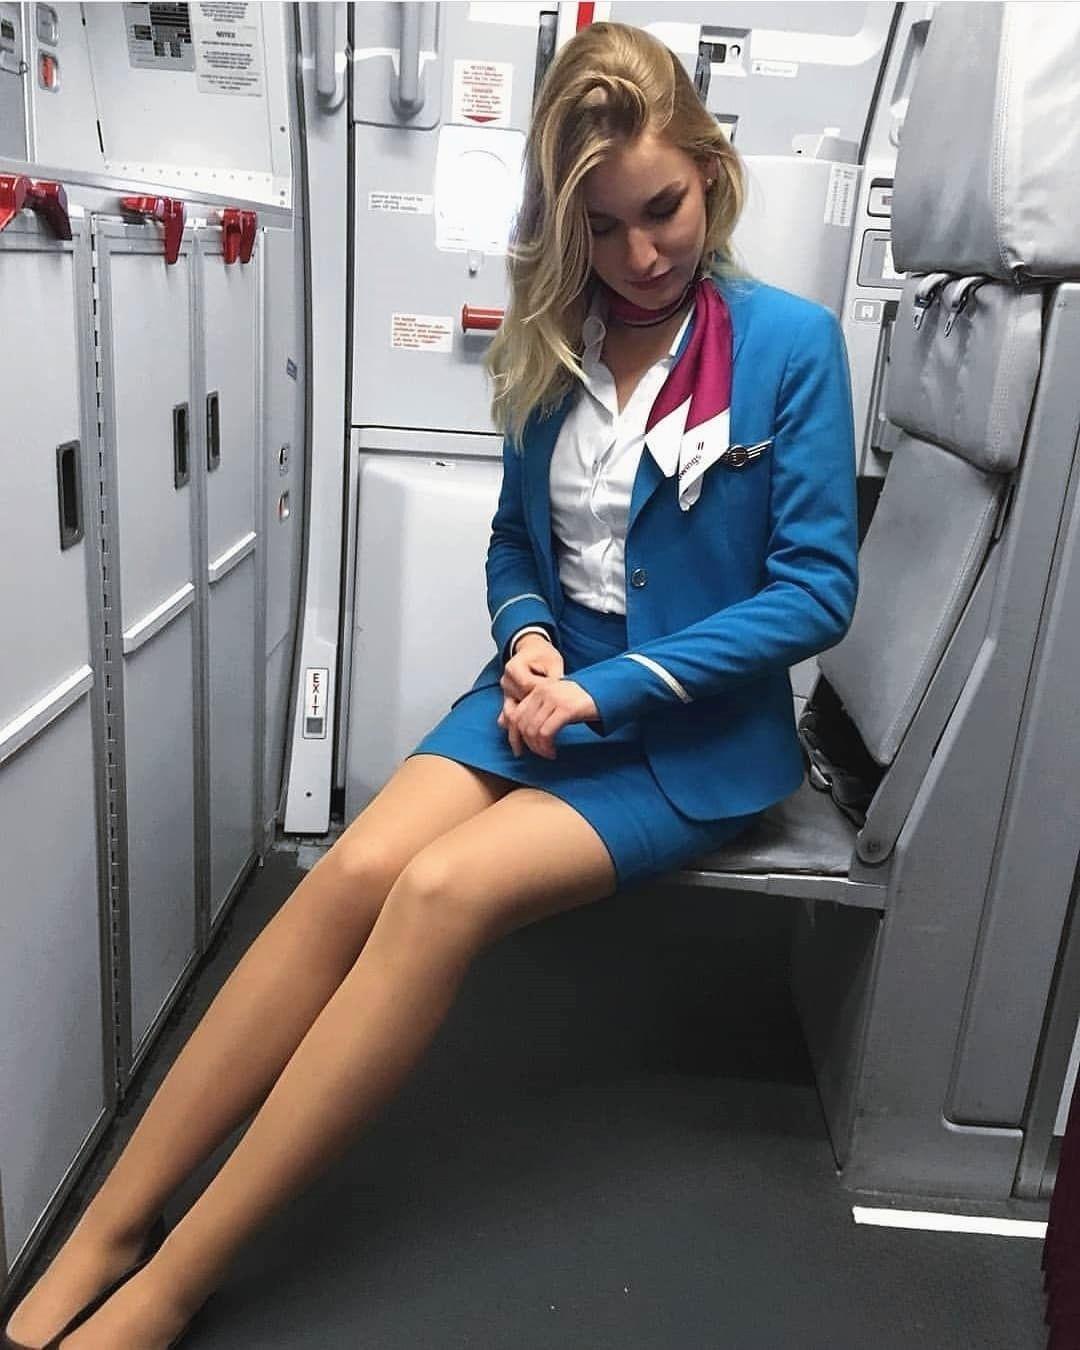 Pin on Sexy flight attendants